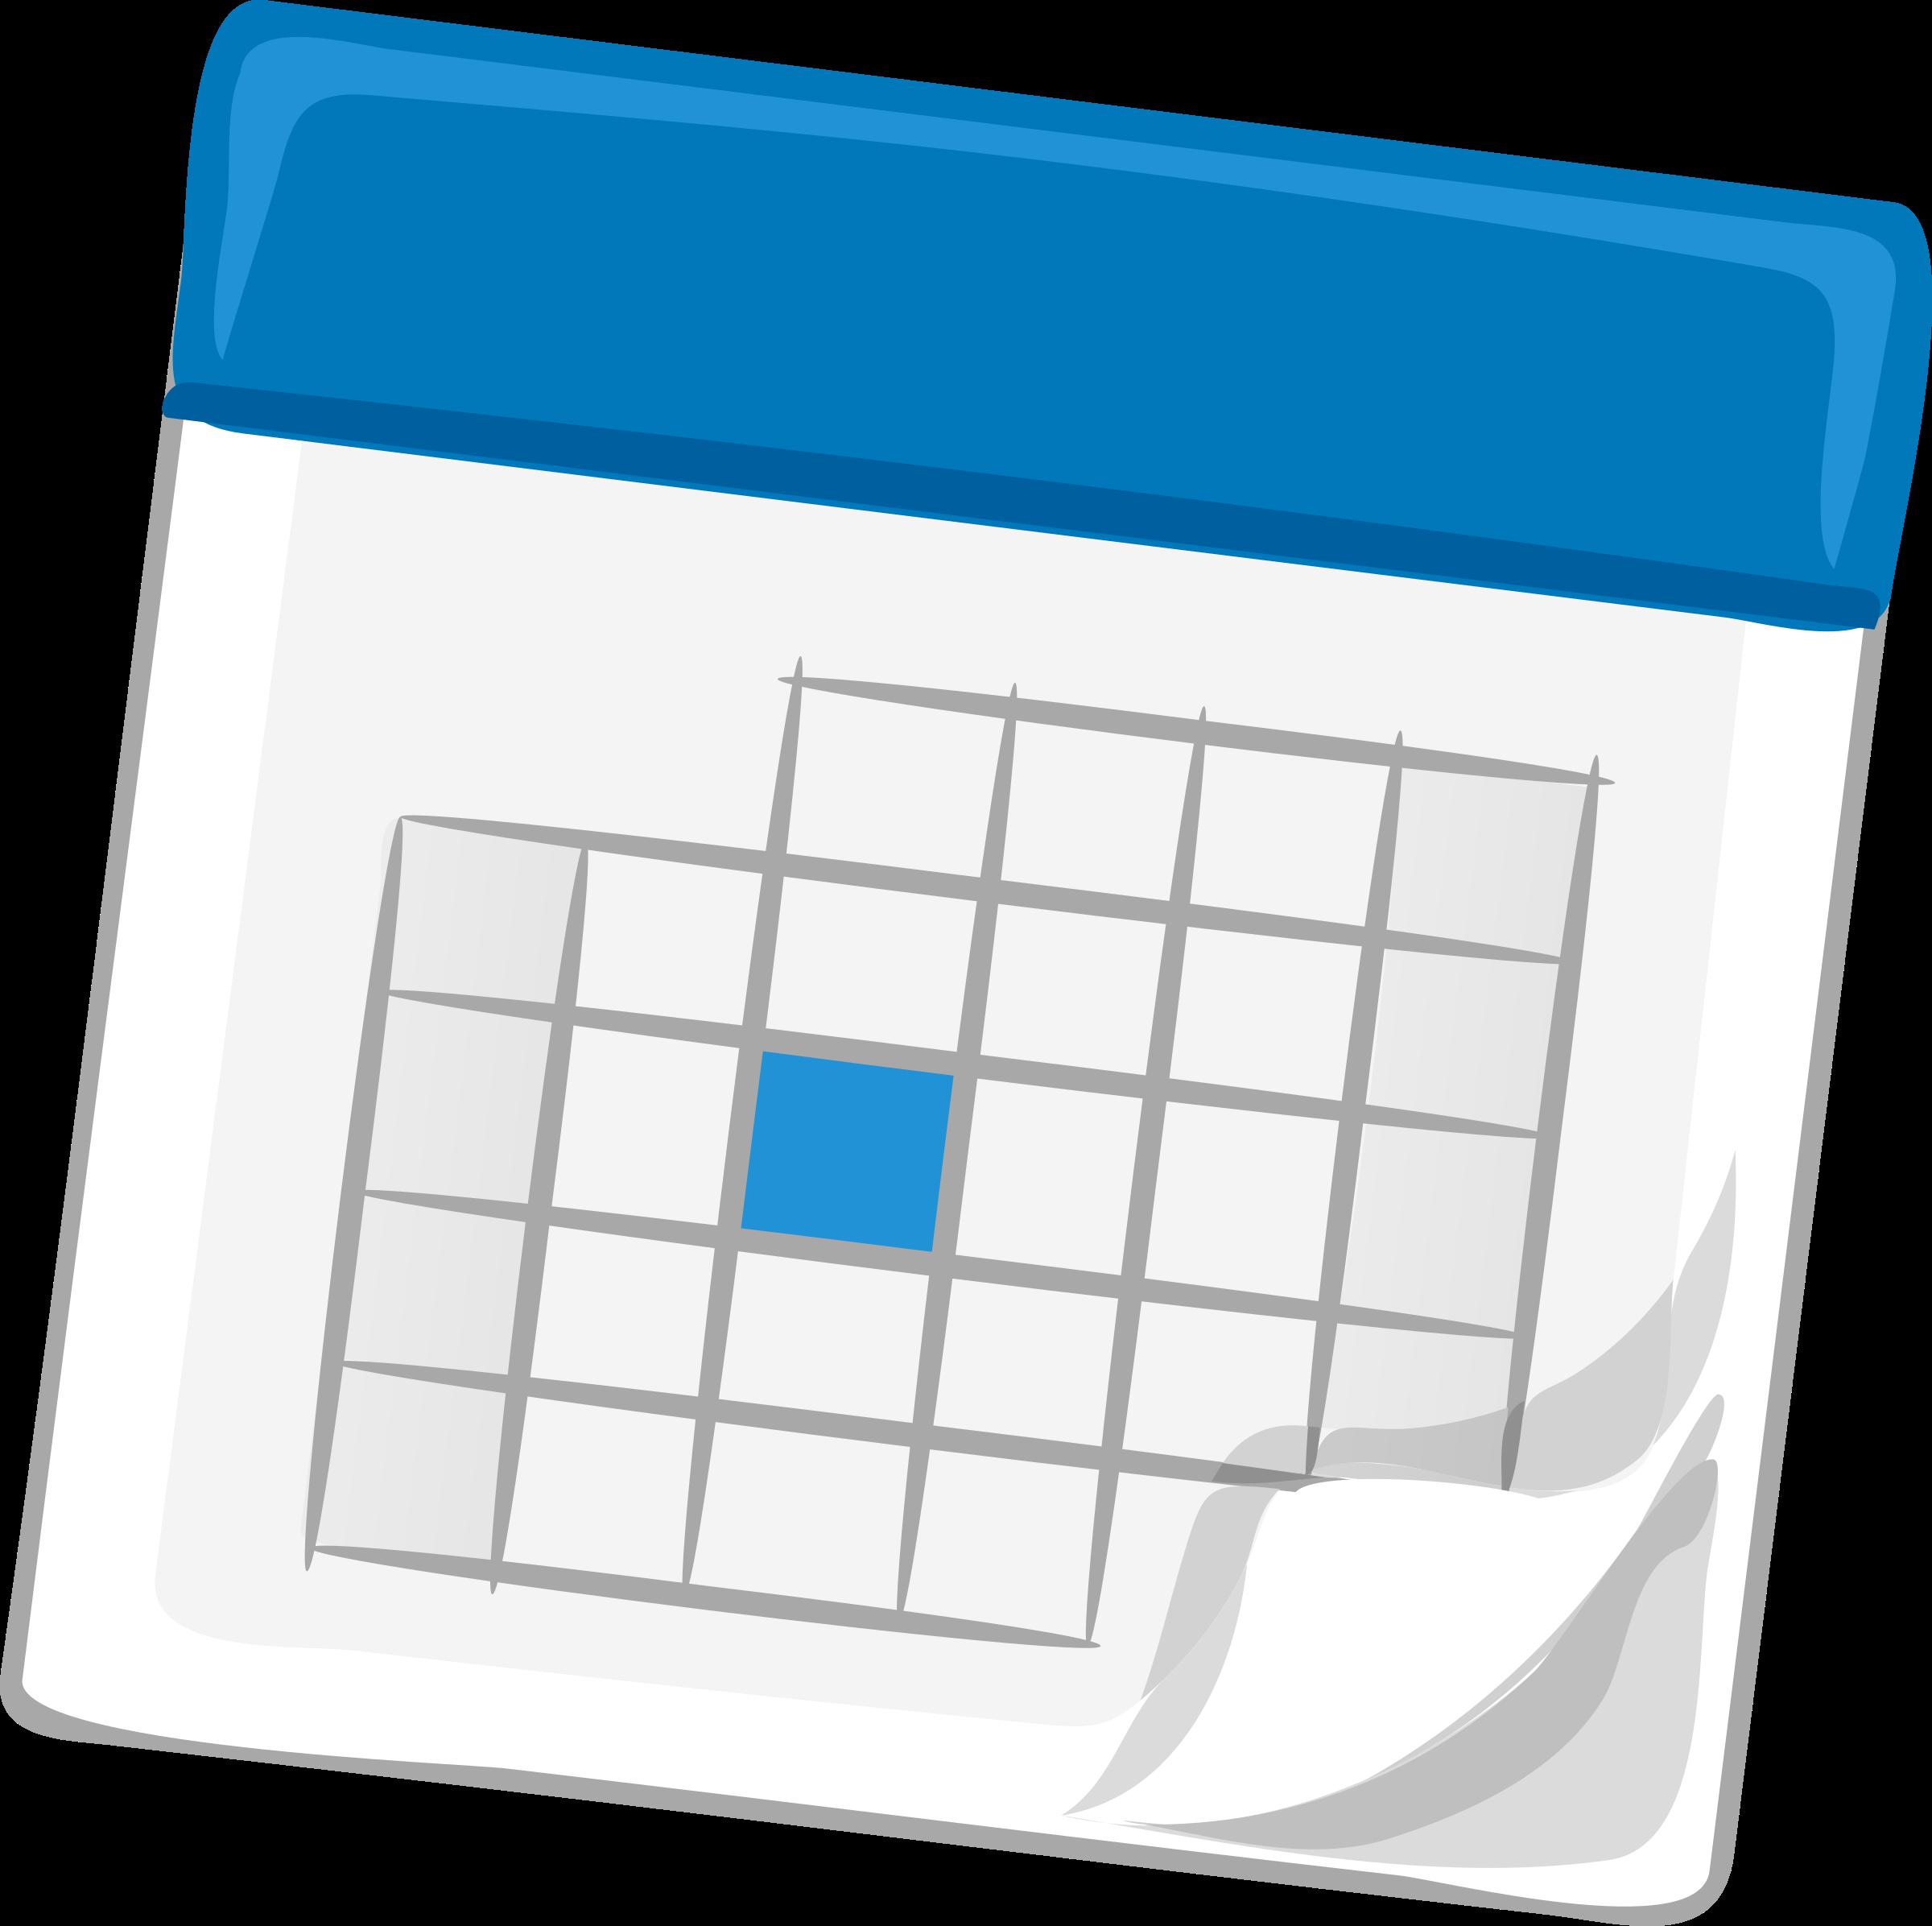 Calendar Clip Art Transparent Background : Clipart calendar blue